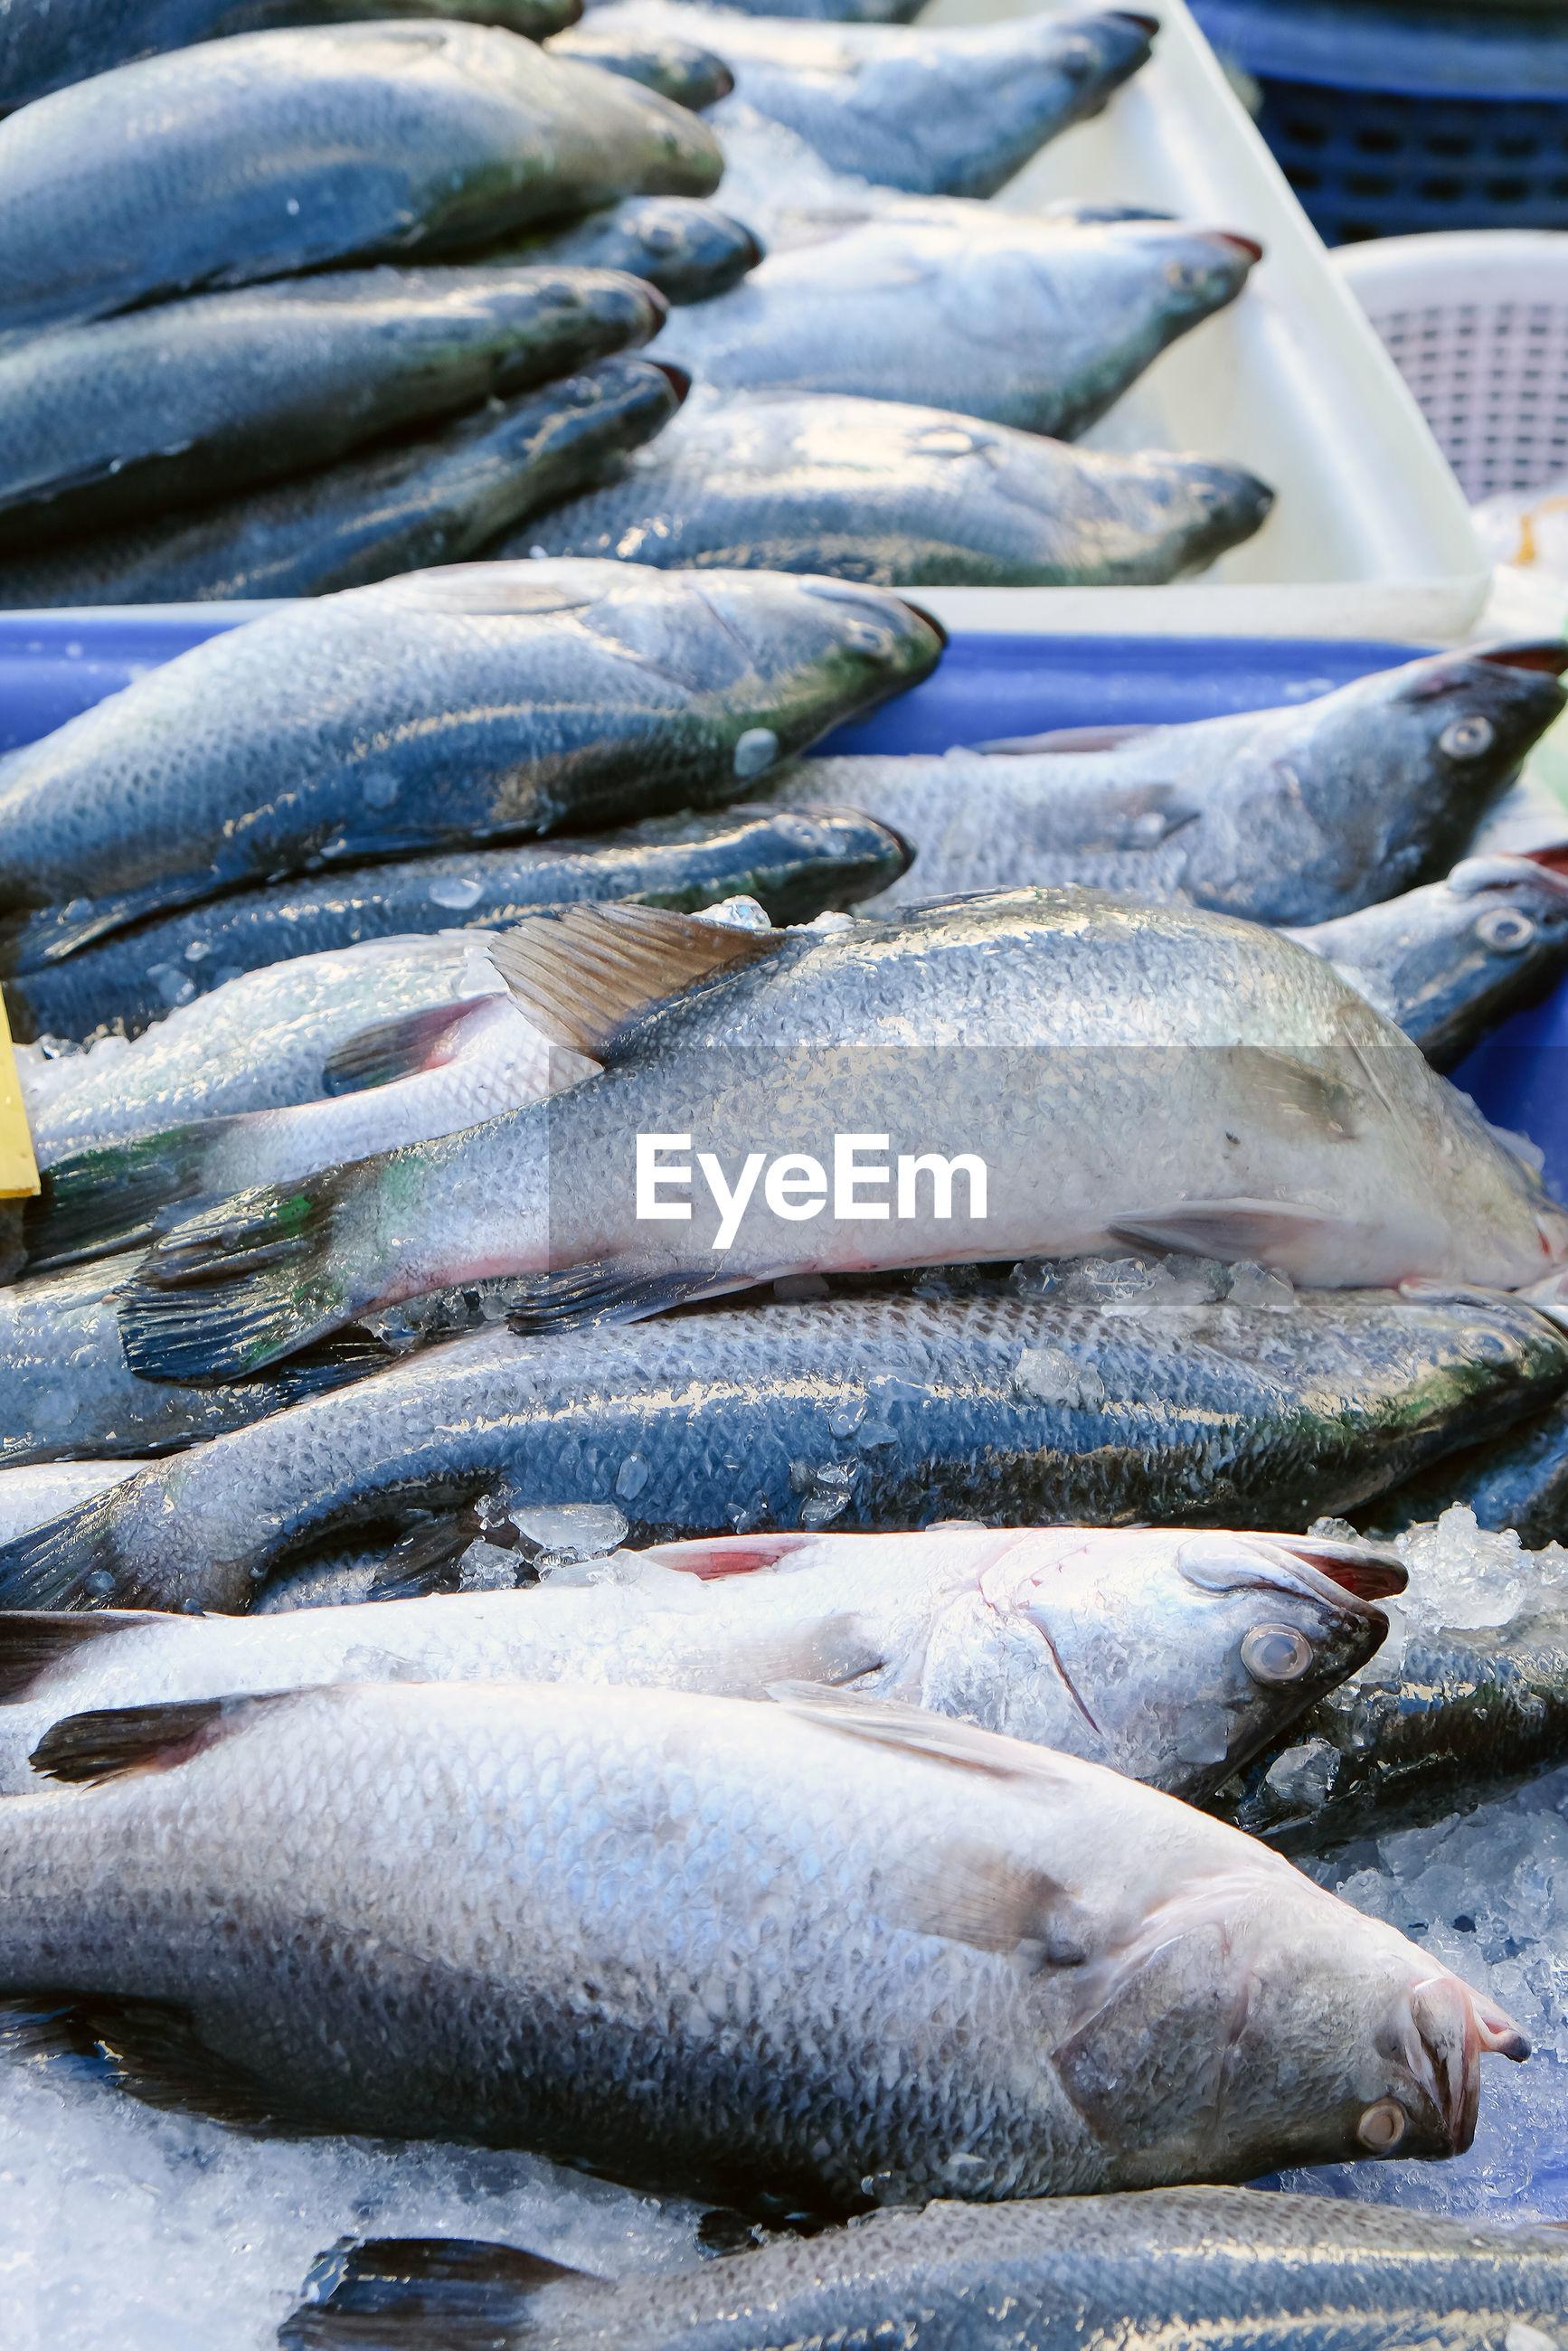 HIGH ANGLE VIEW OF FISH AT MARKET STALL